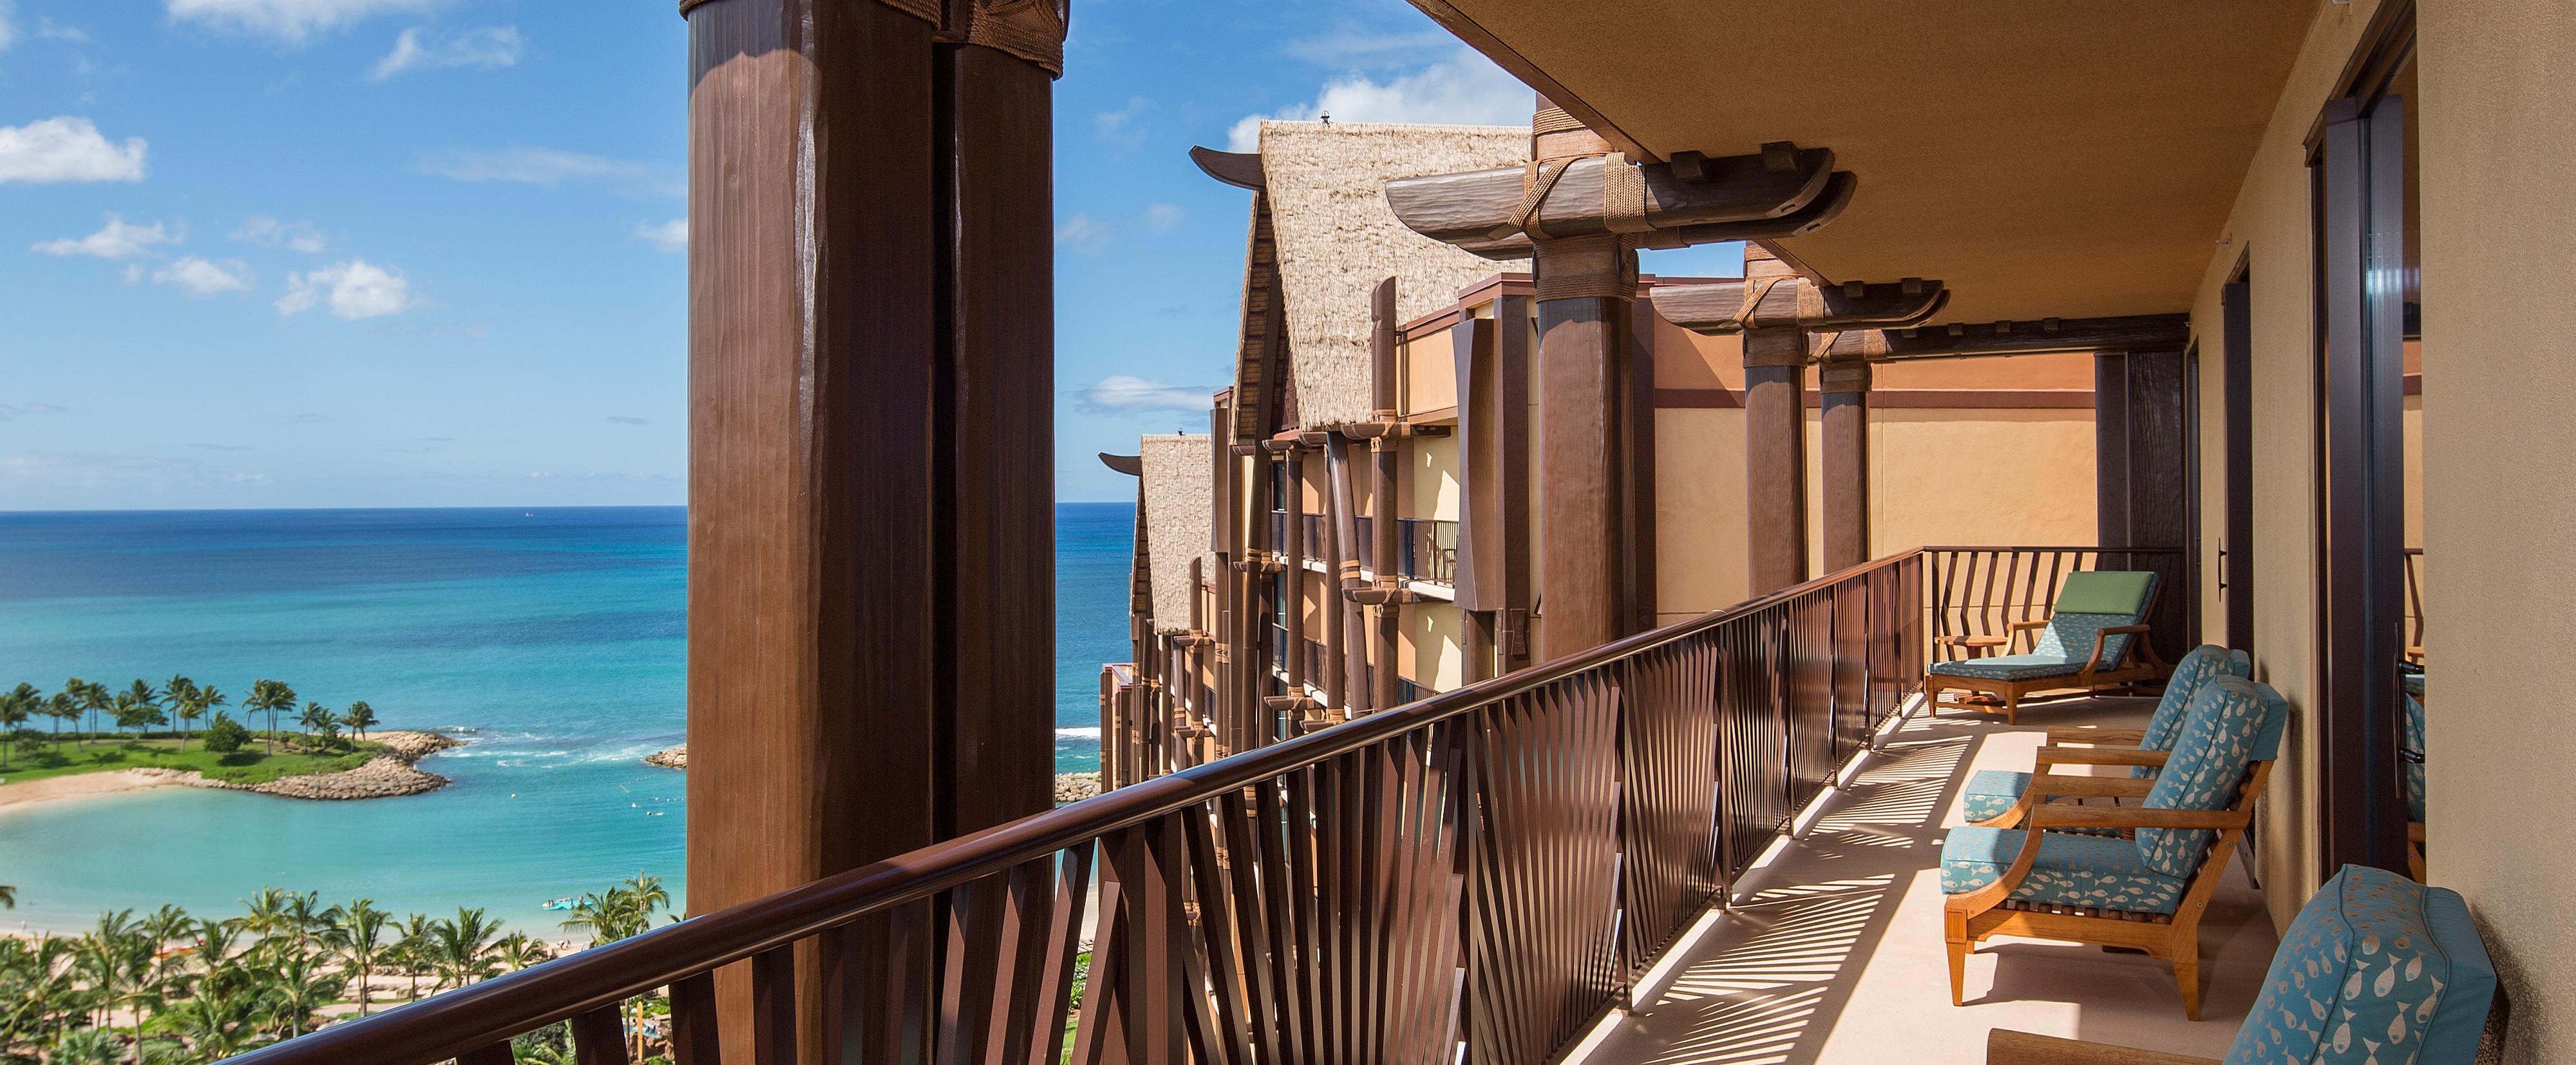 One Bedroom Deluxe Suite Aulani Hawaii Resort Amp Spa